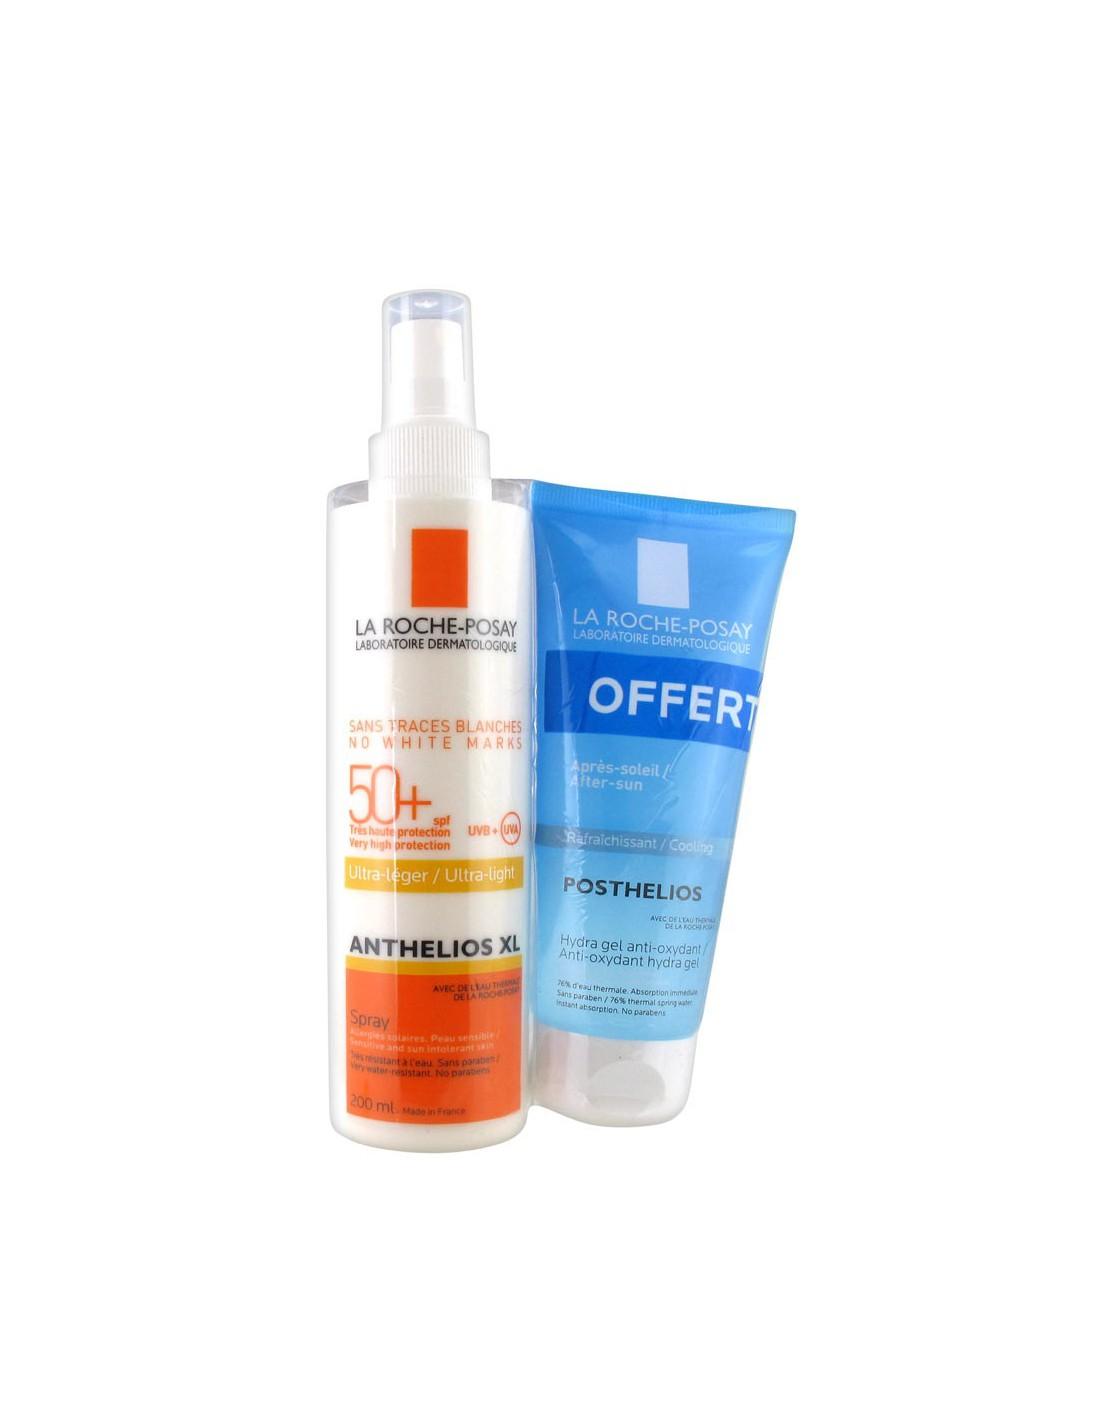 Anthelios XL Ultra-Léger Spray SPF 50+ 200ml + Posthelios